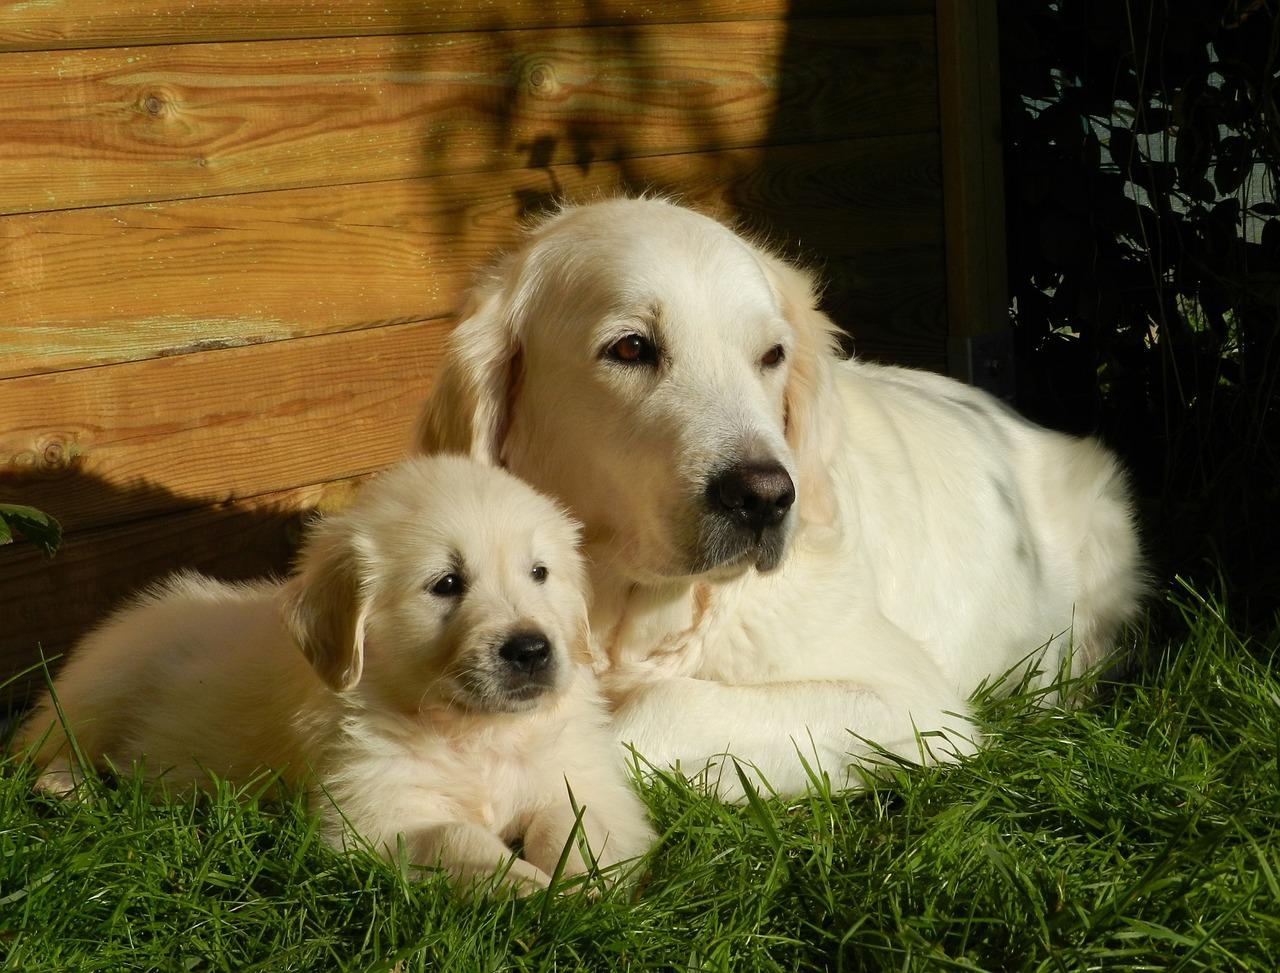 dog, puppy, golden retriever